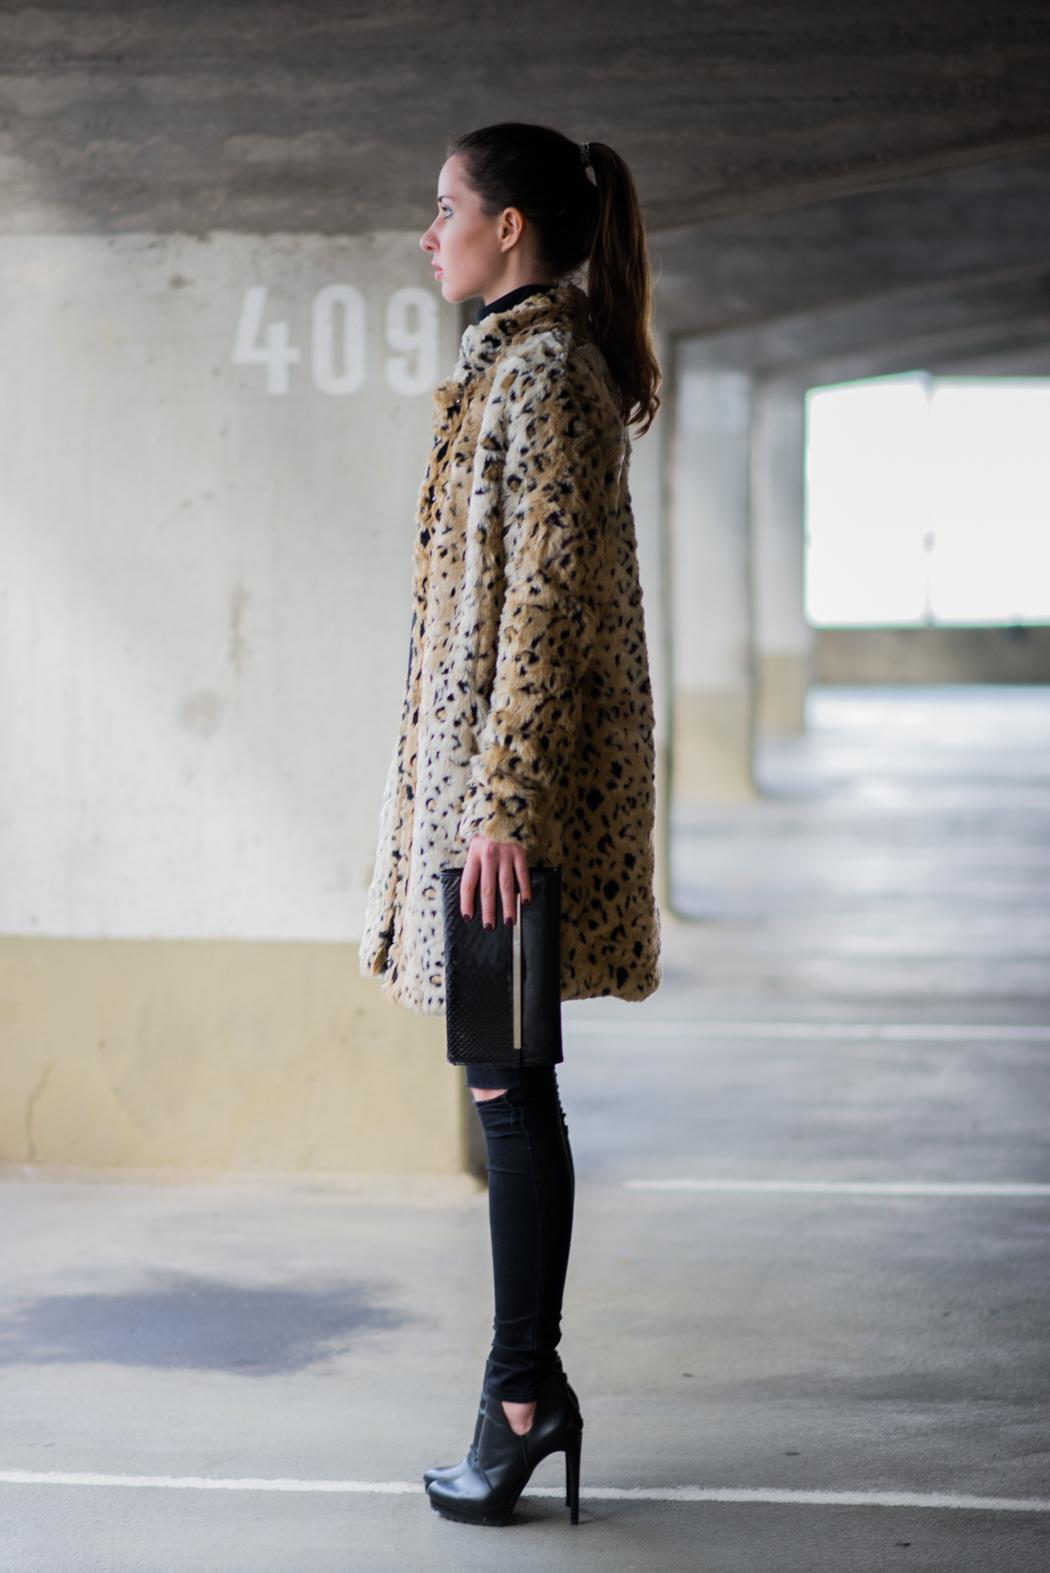 Leomantel-Ripped-Diesel-Jeans-Fashionblogger-Lindarella-5